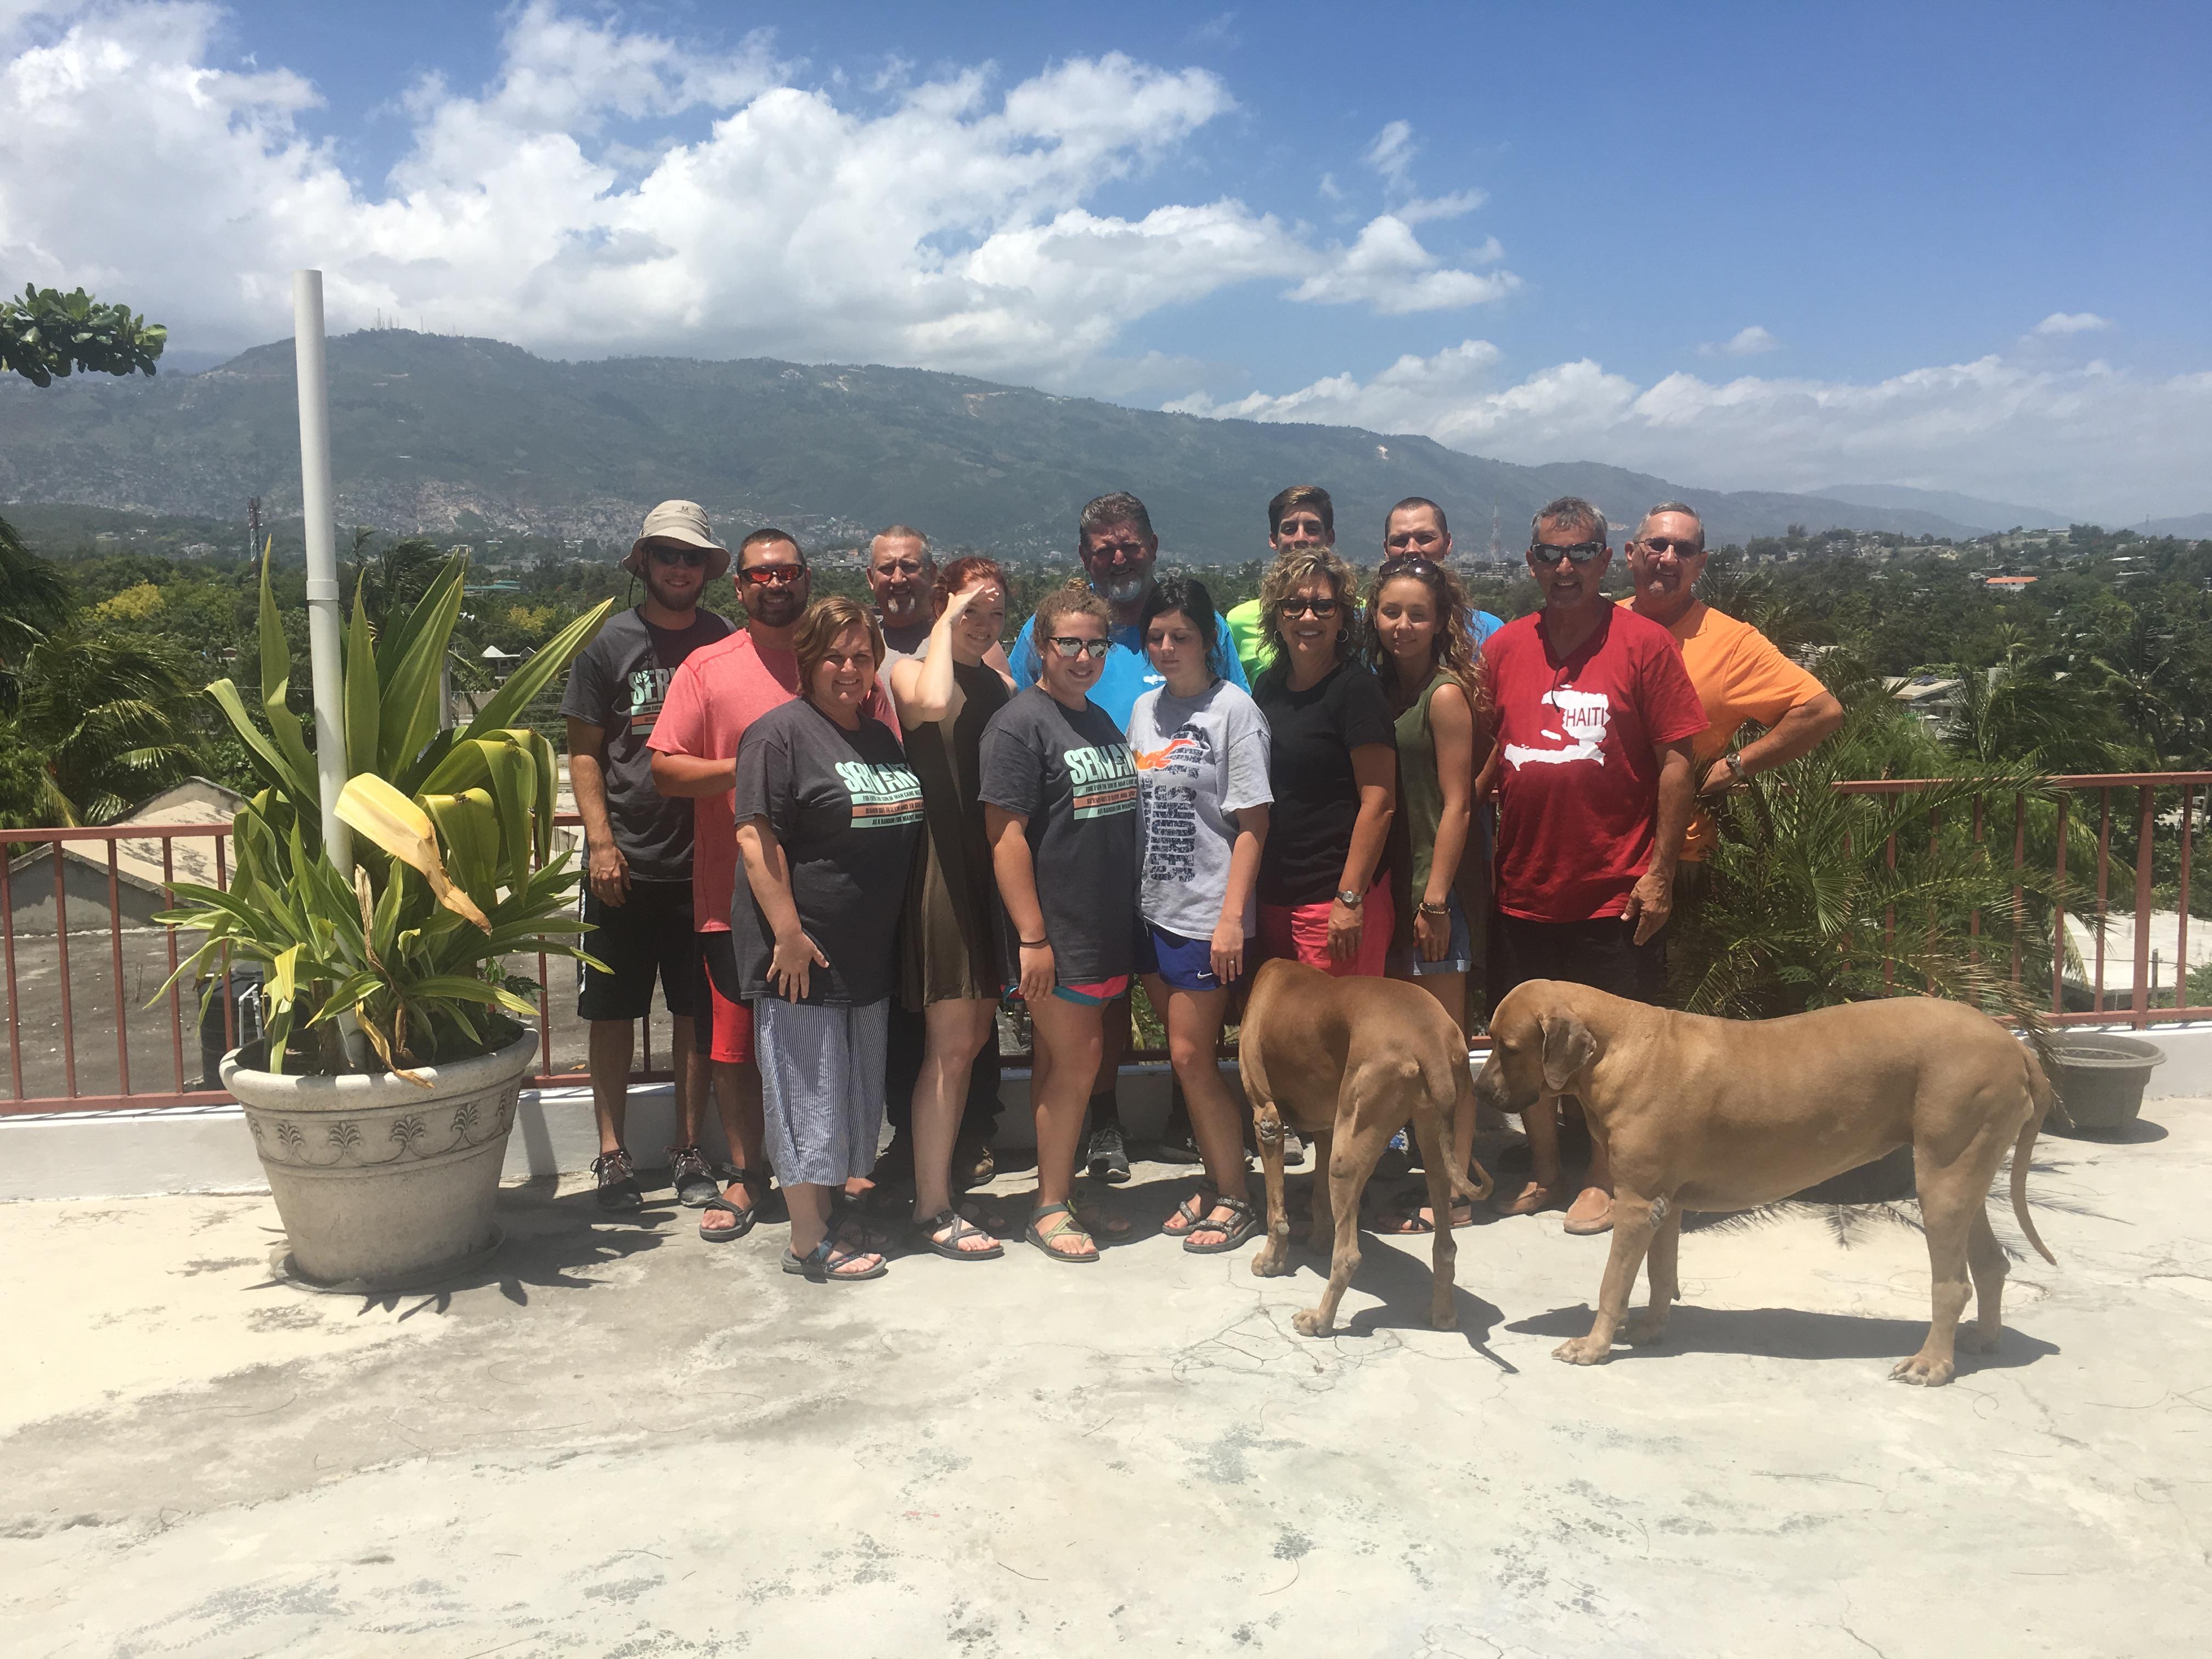 2017 Hands of Hope Mission Team